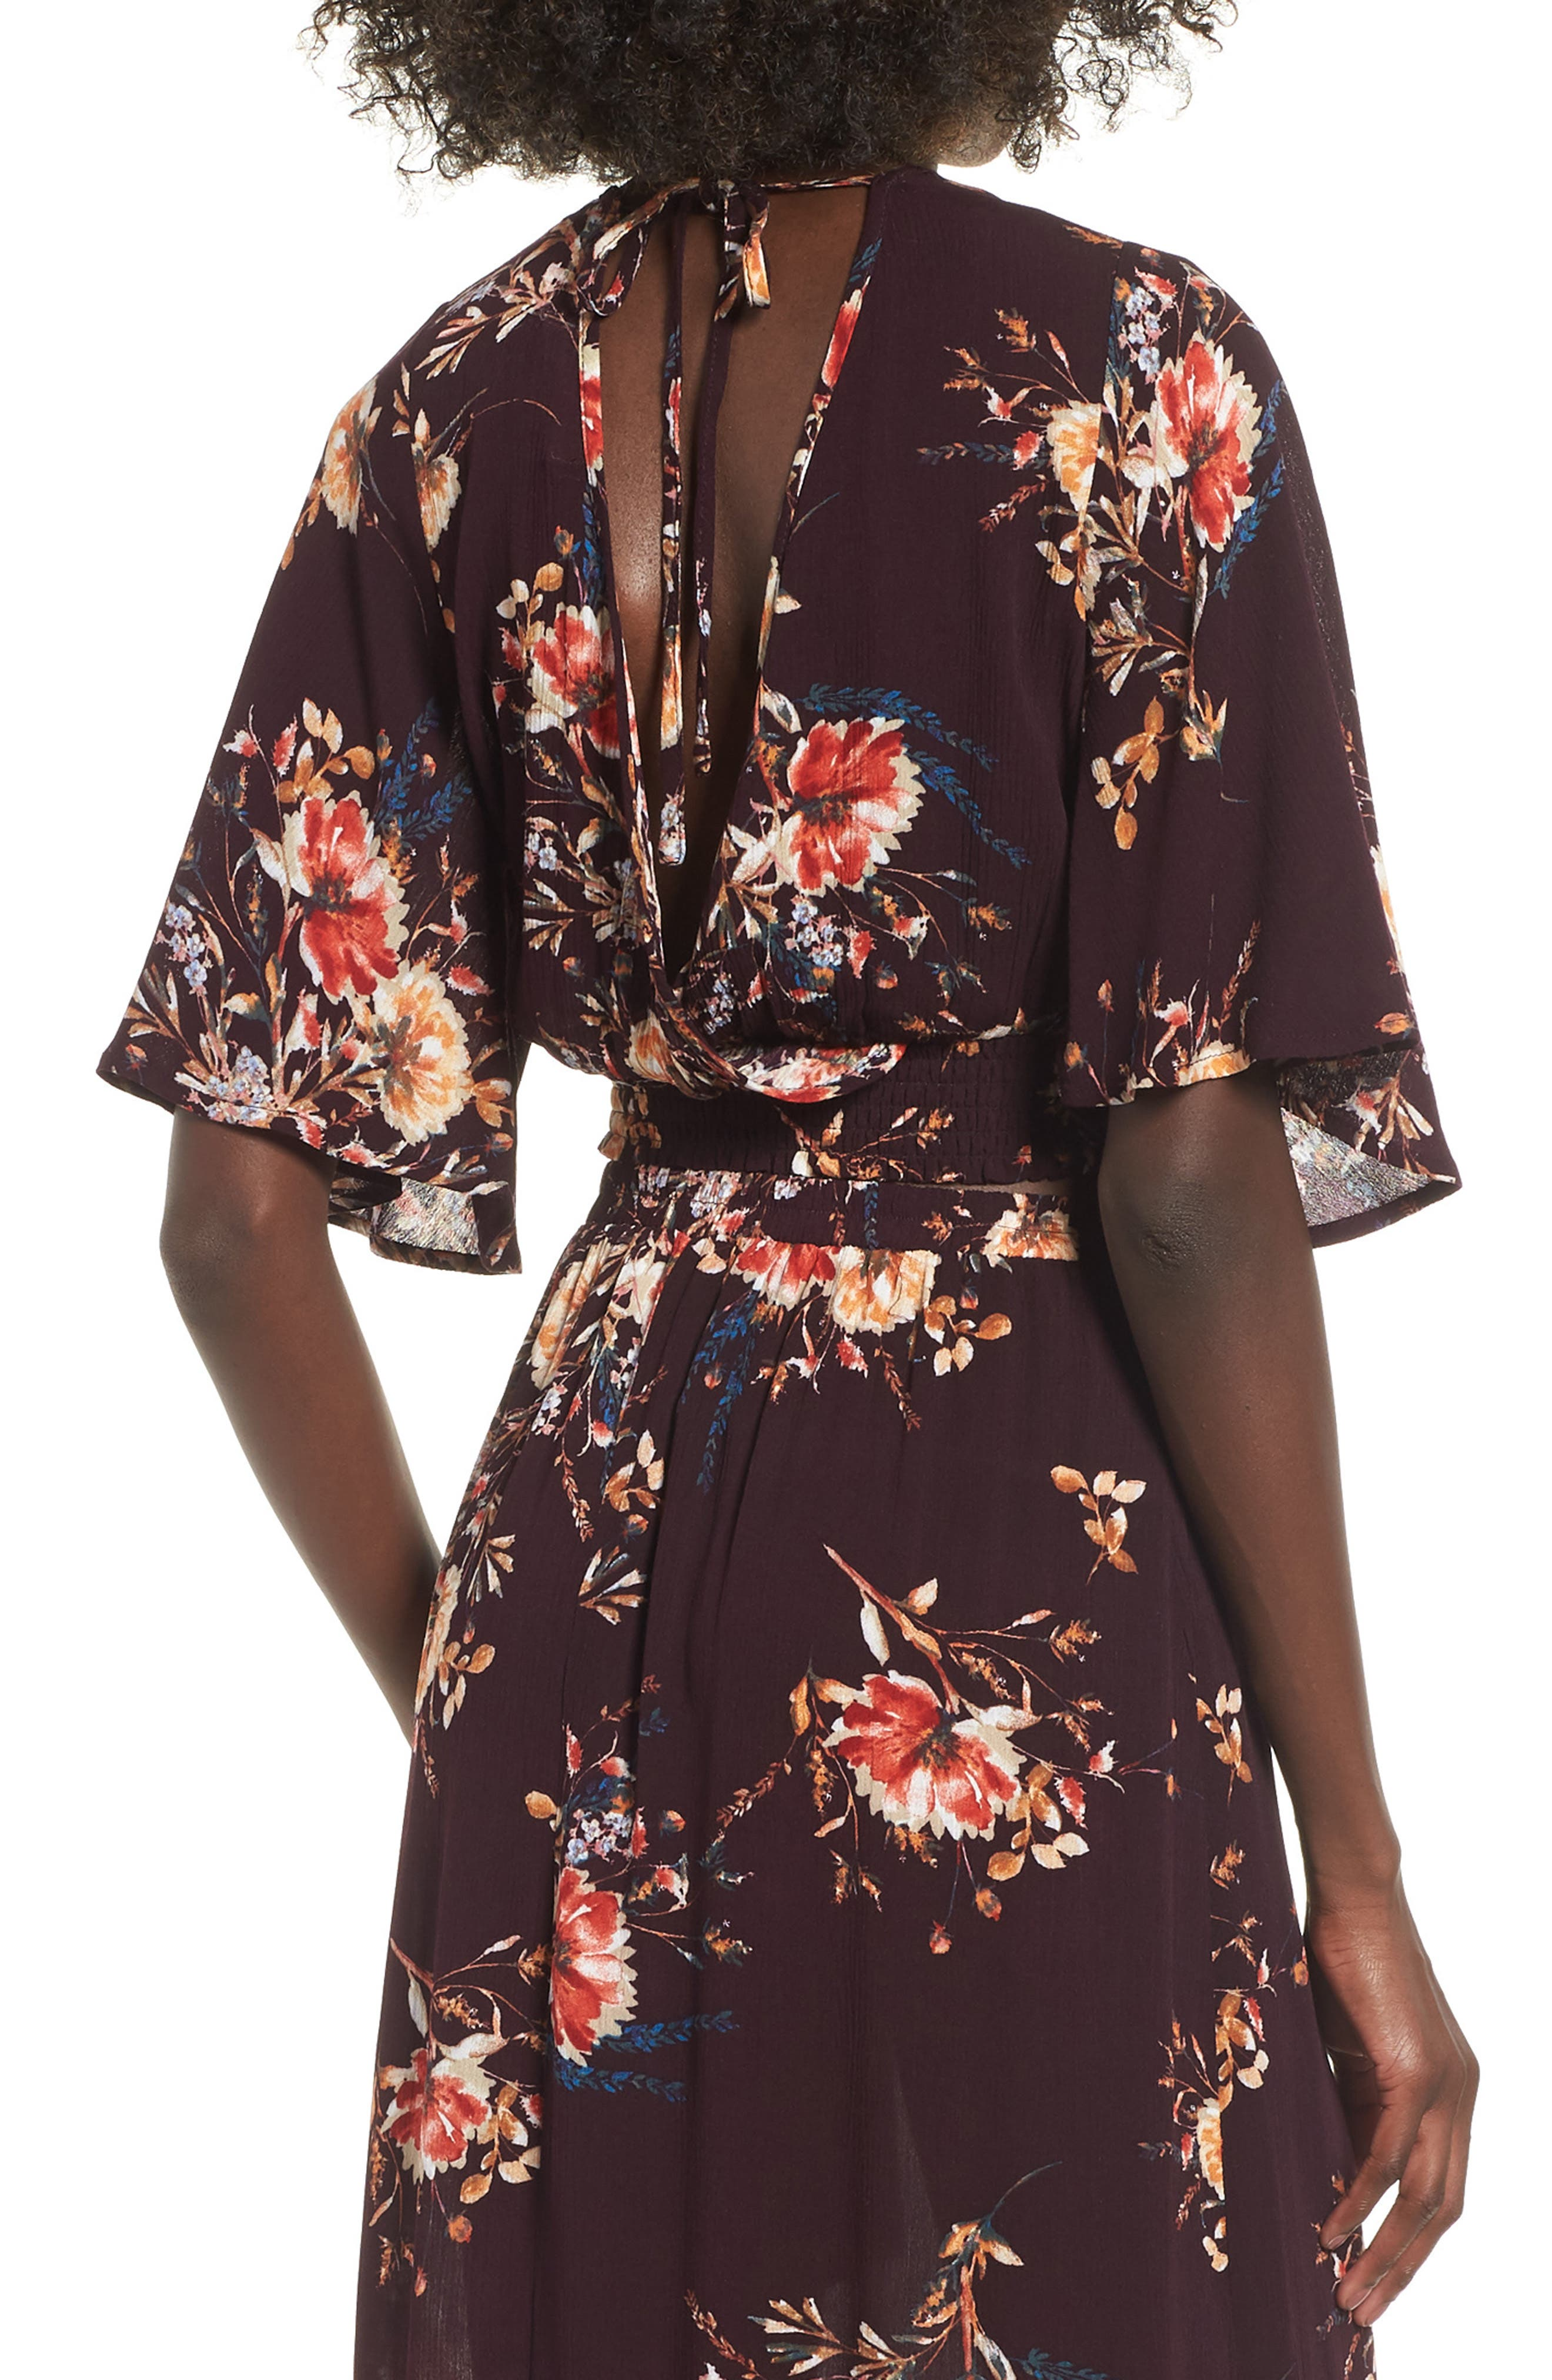 Shadow Floral Tie Back Crop Top,                             Alternate thumbnail 2, color,                             BURGUNDY/ PEACH